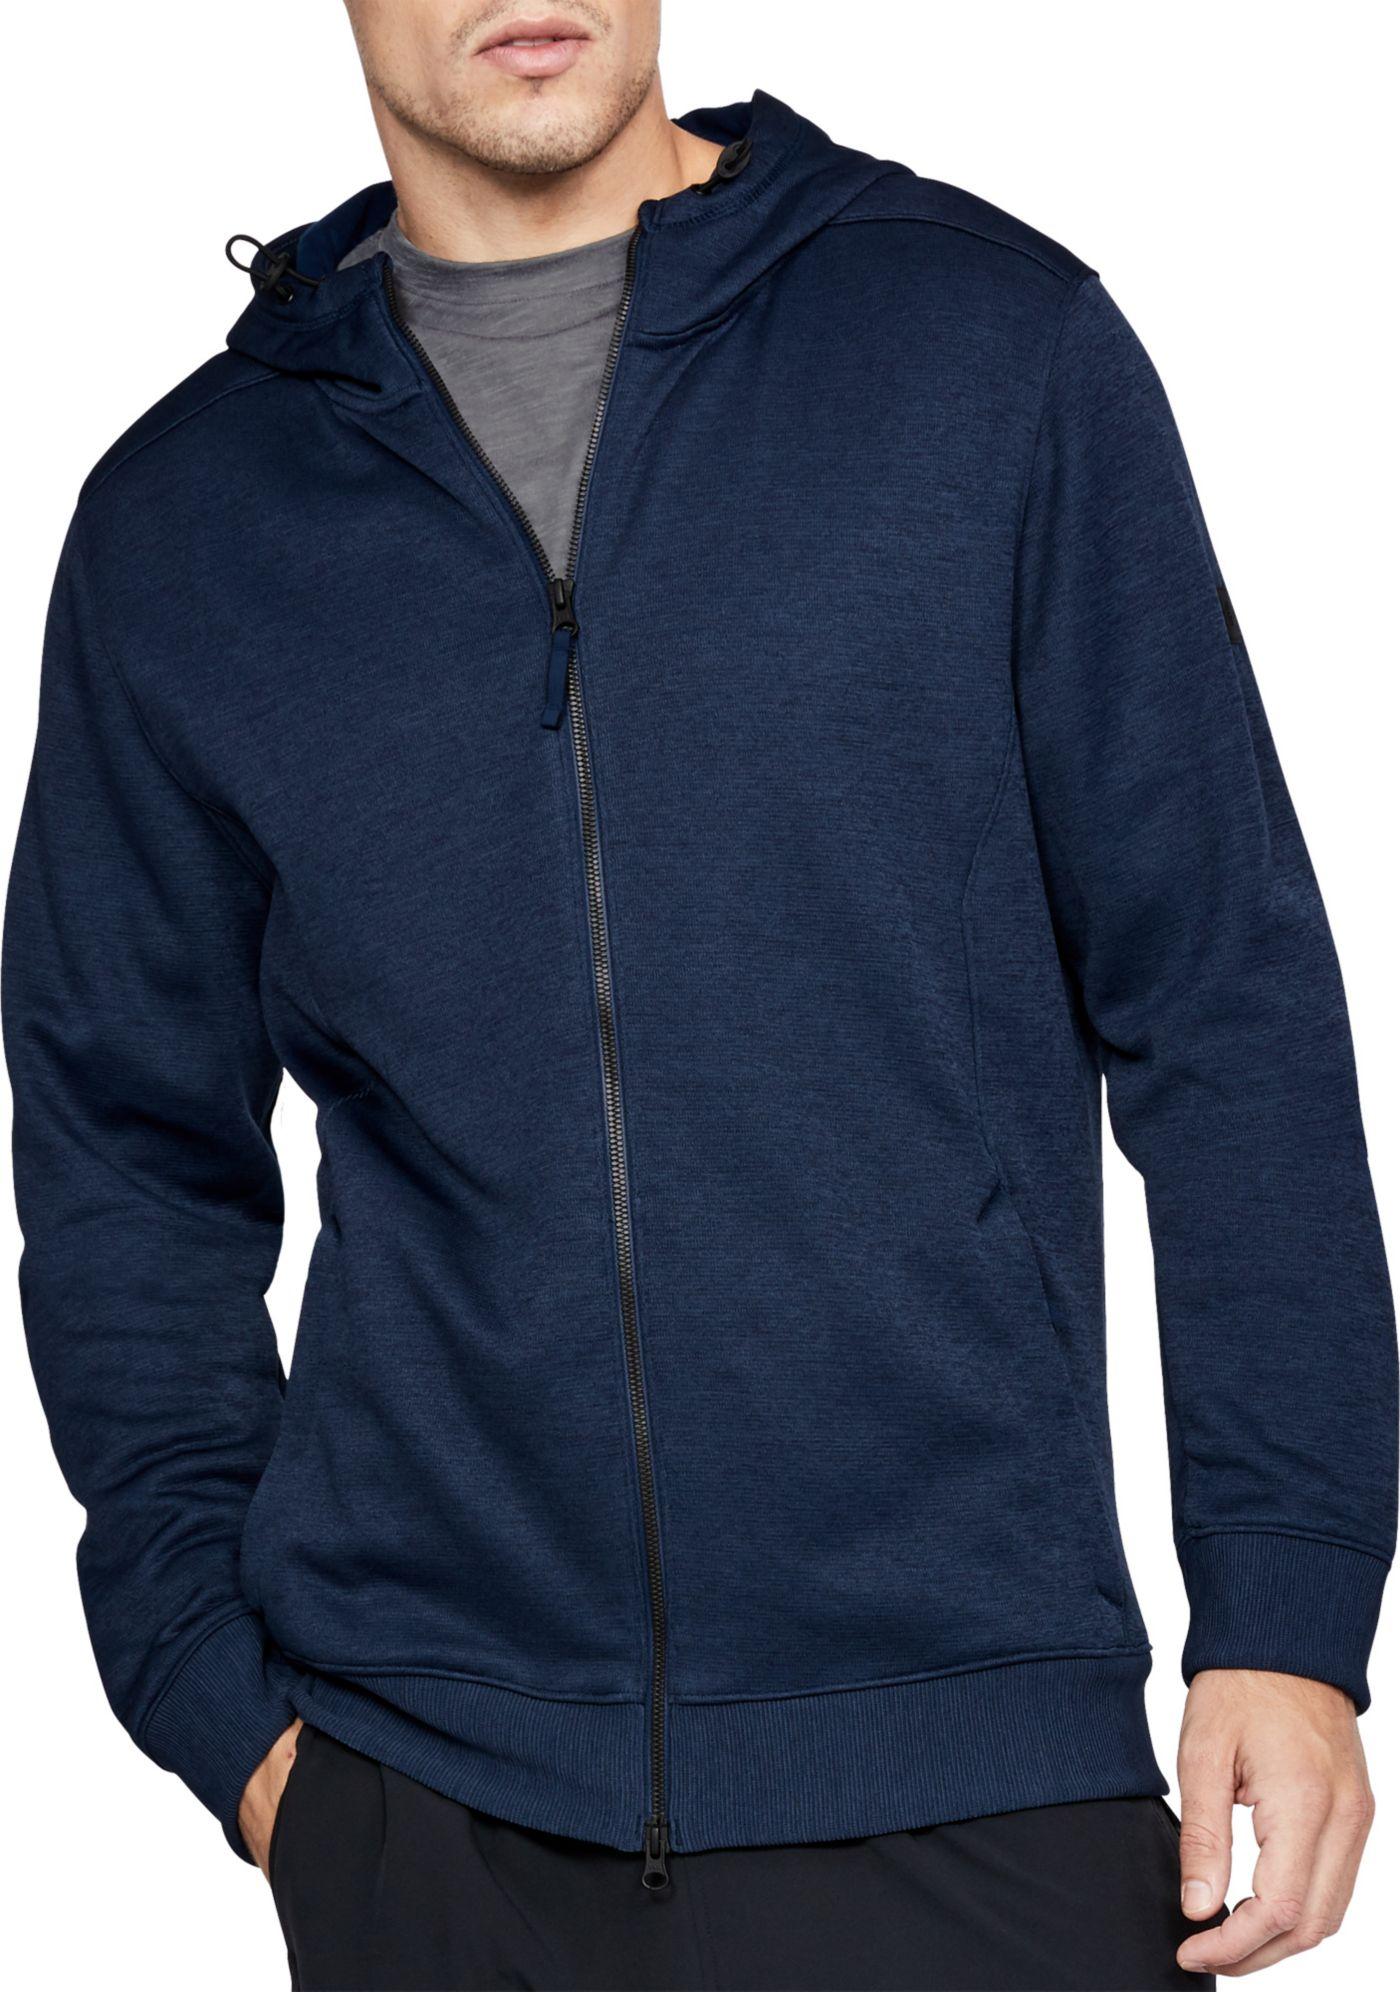 Under Armour Men's Sportstyle Sweater Fleece Full-Zip Long Sleeve T-Shirt